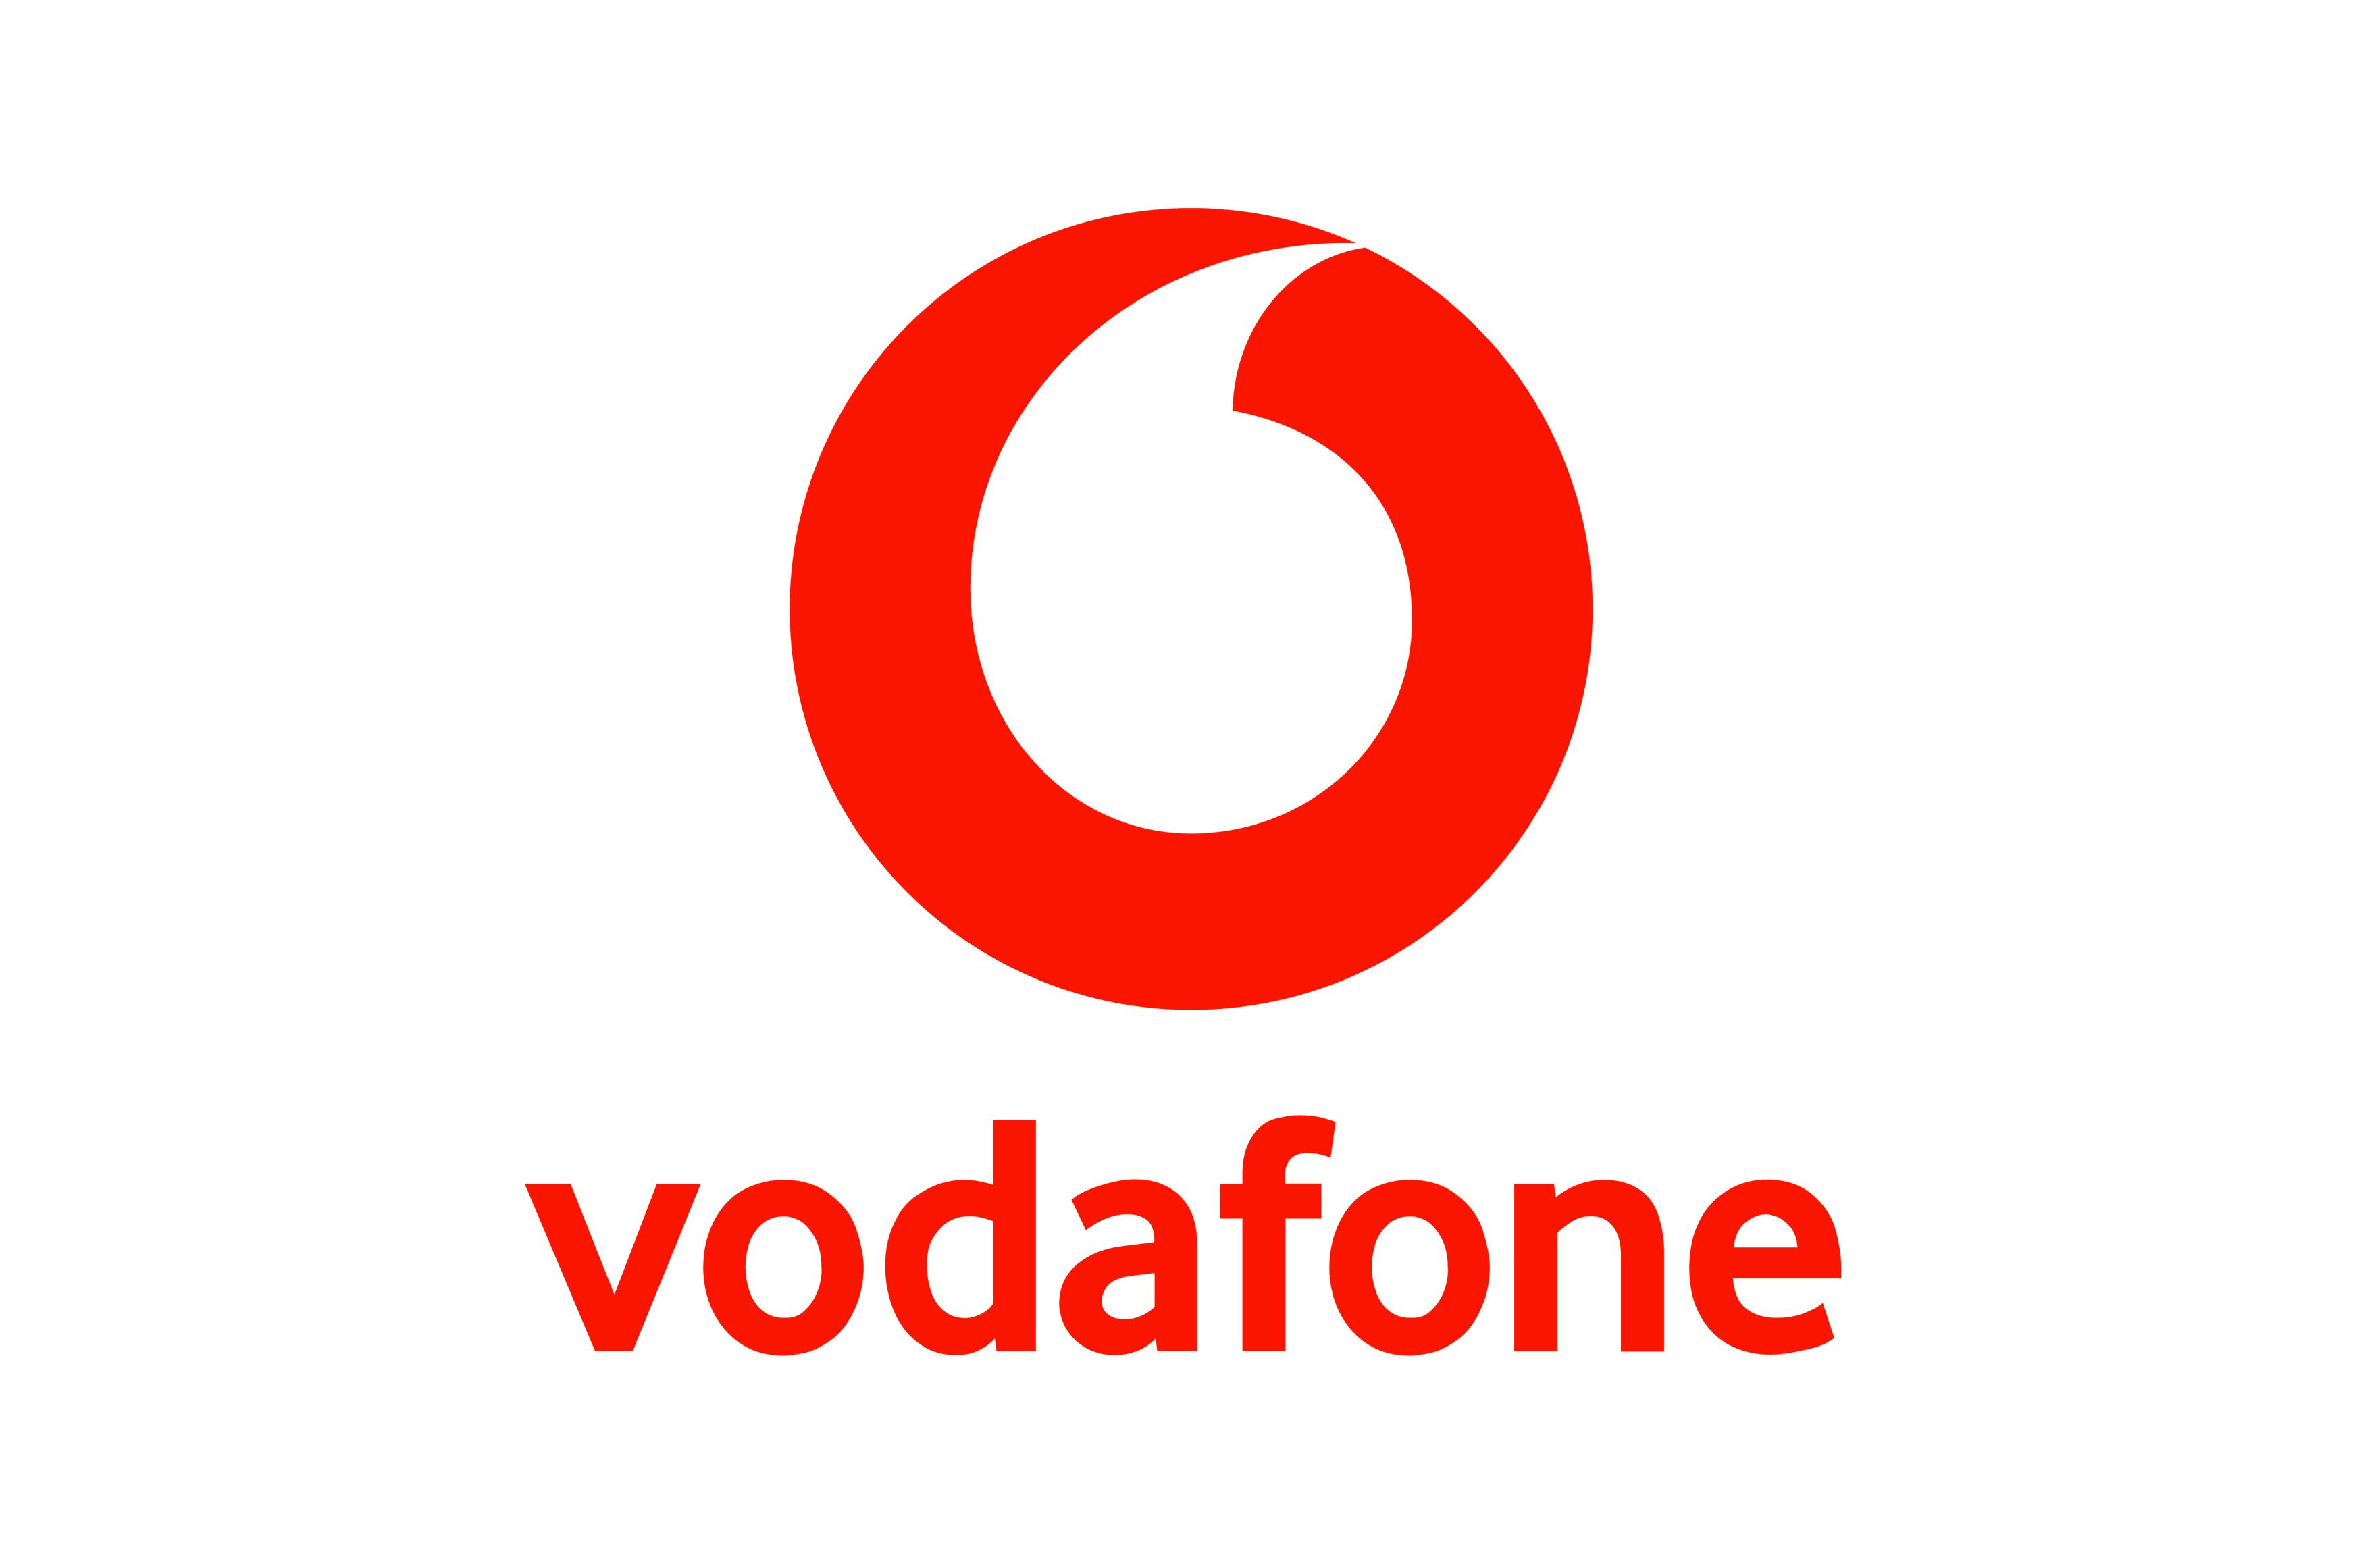 Vodafone By Brand Union Vodafone Logo Vodafone Logos